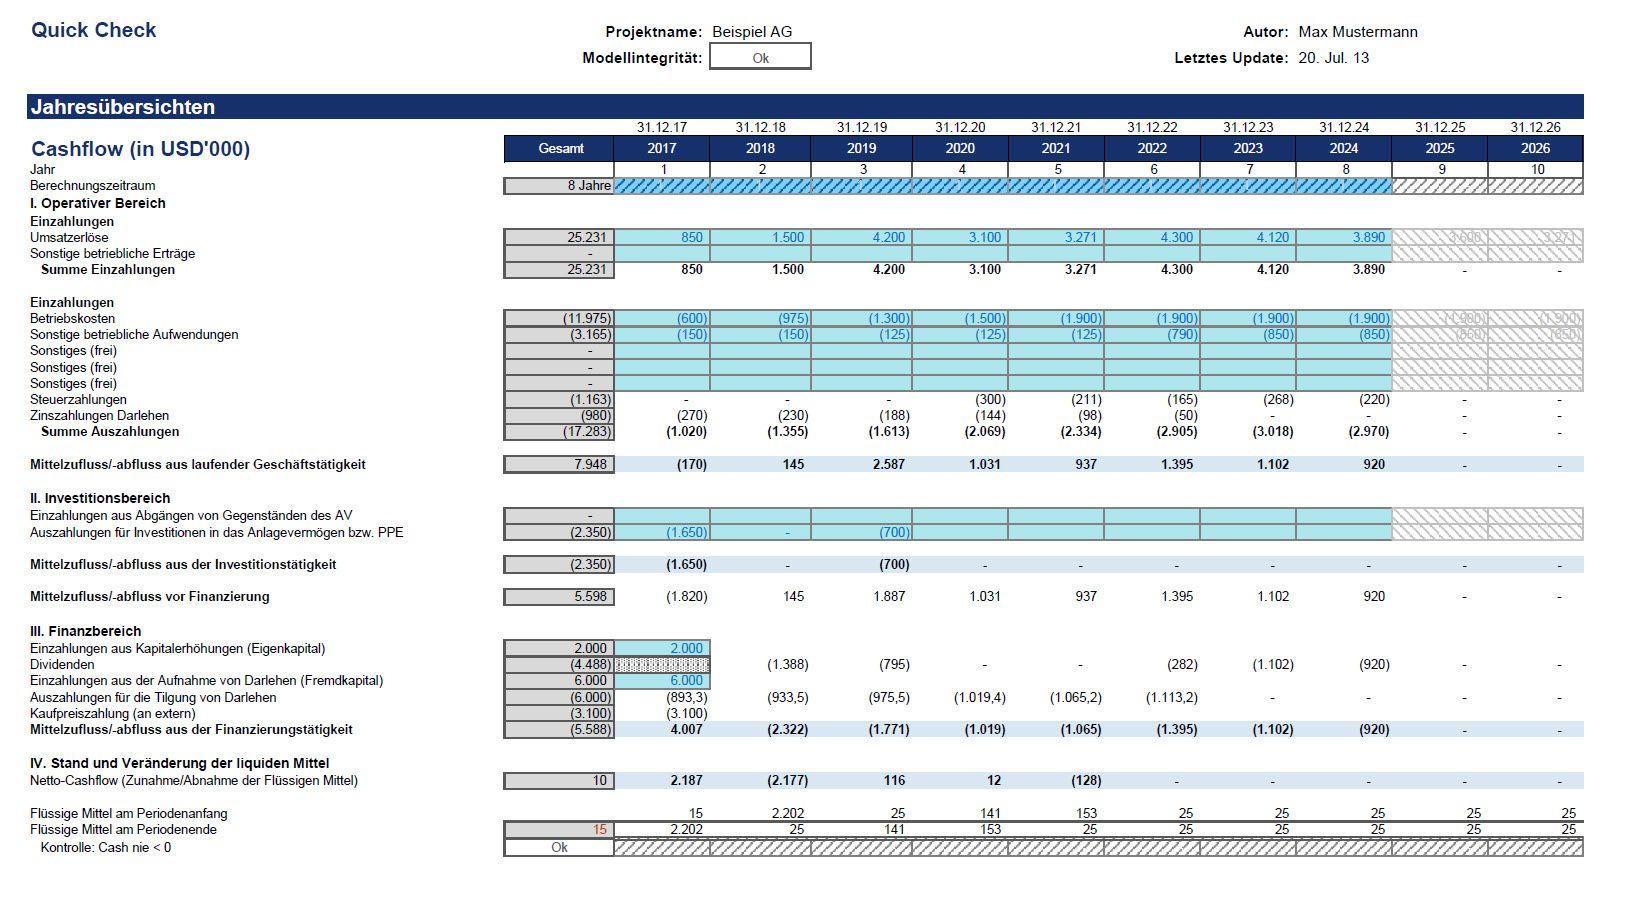 Charmant Monatliche Cashflow Vorlage Bilder - Entry Level Resume ...